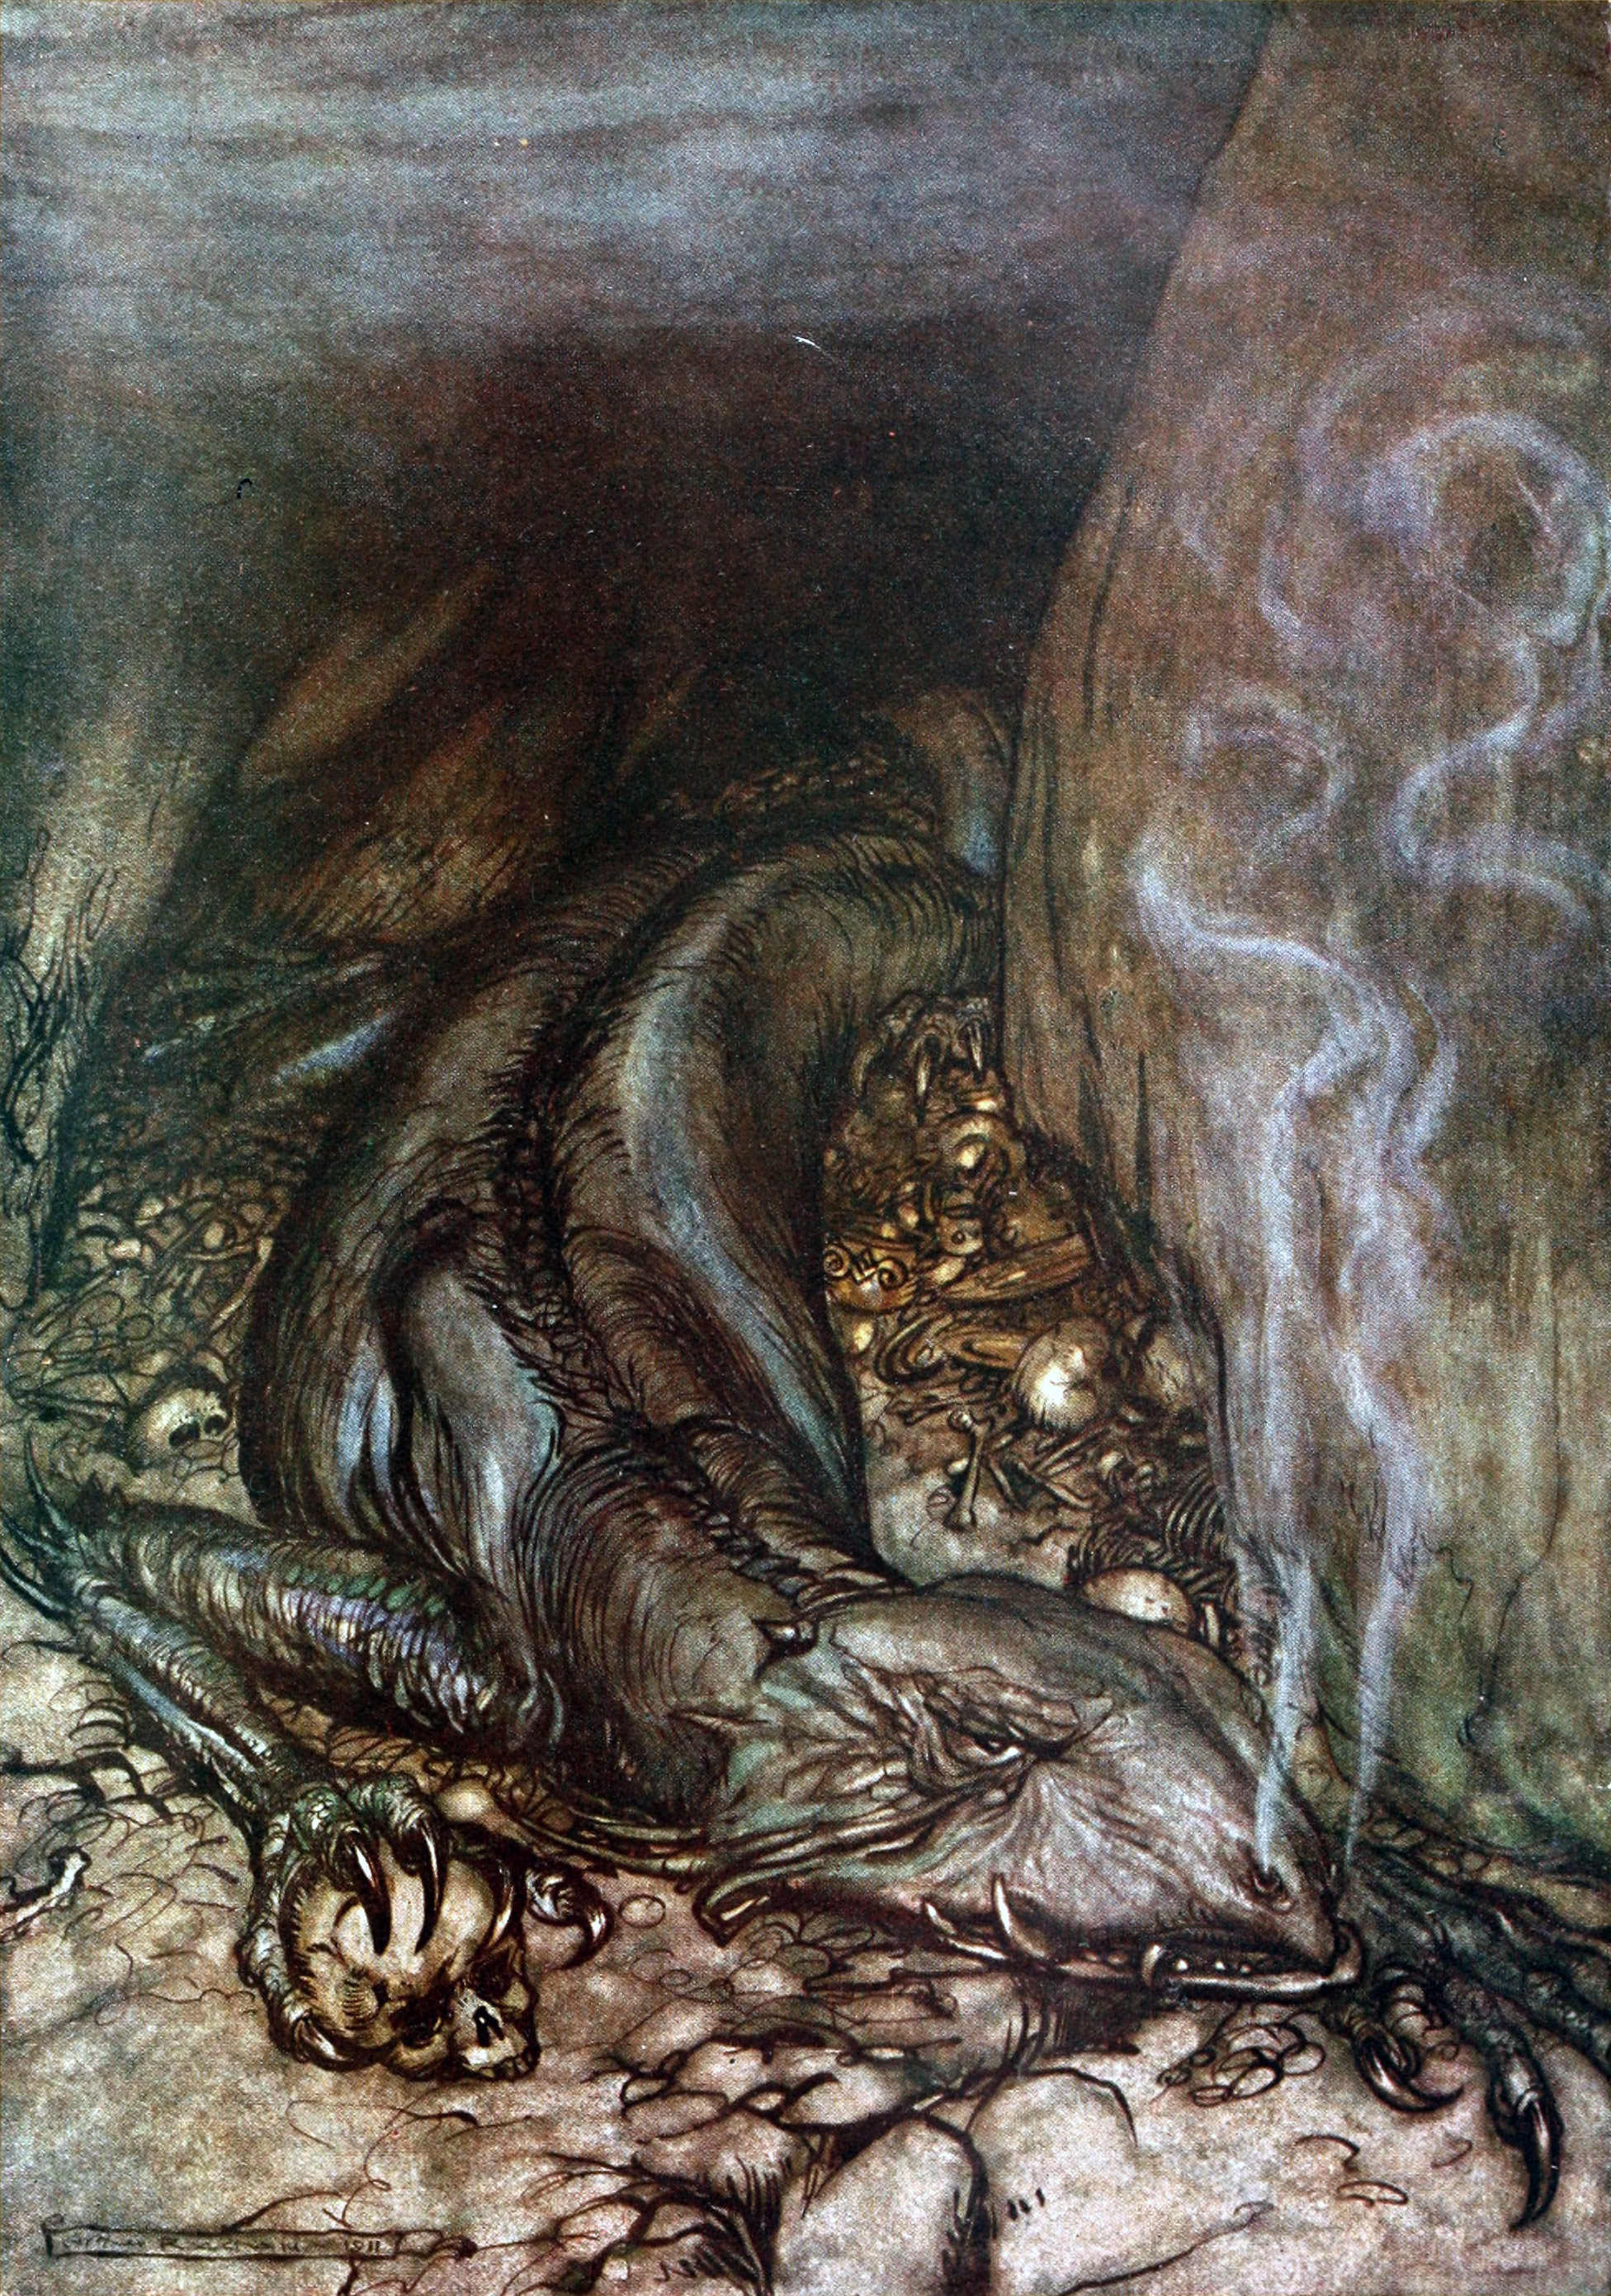 http://upload.wikimedia.org/wikipedia/commons/9/9b/Siegfried_and_the_Twilight_of_the_Gods_p_022.jpg